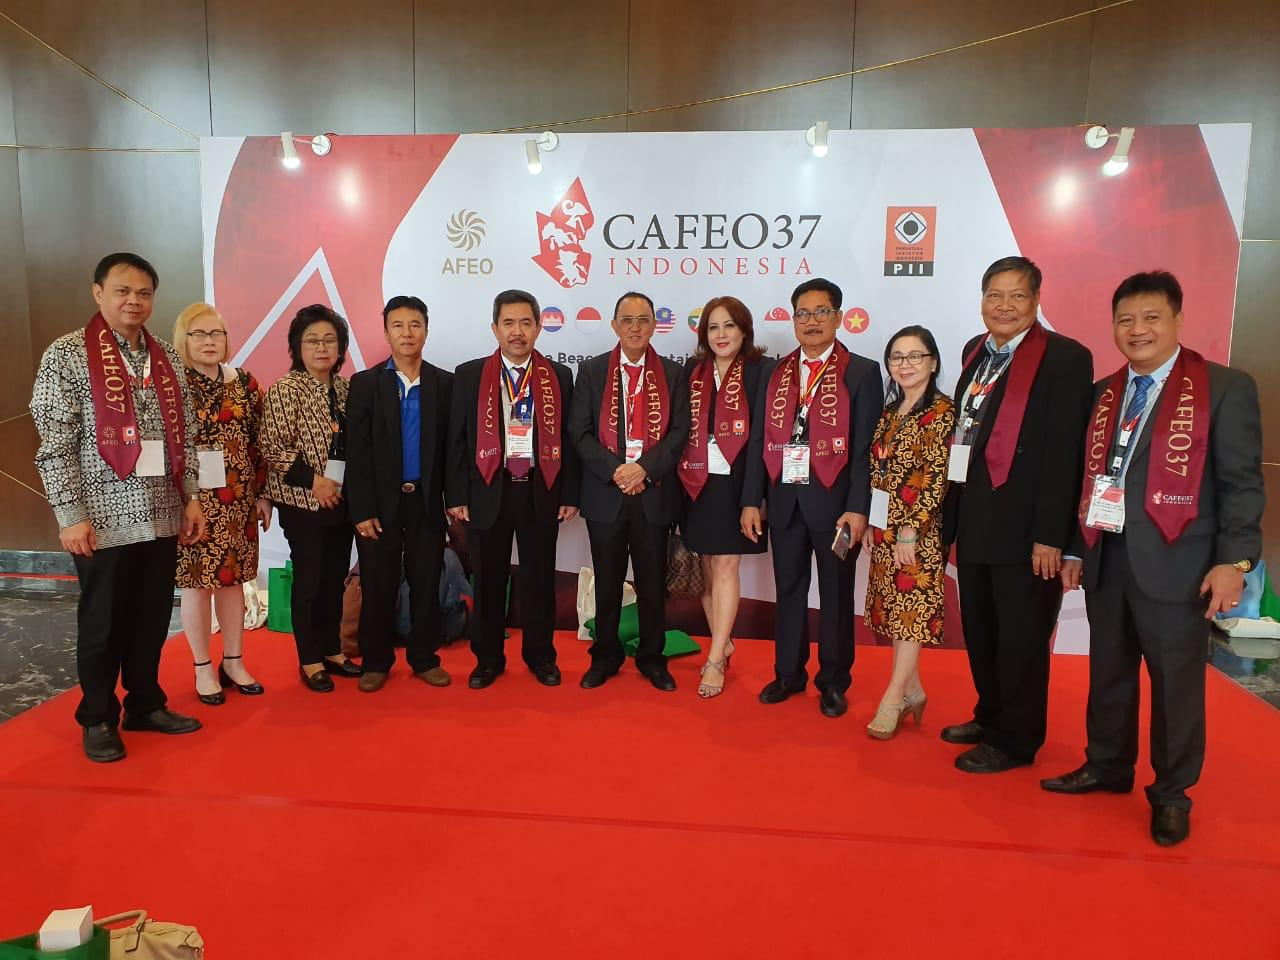 ROR Hadiri Acara Puncak Conference of ASEAN Federation of Engineerings Organizations